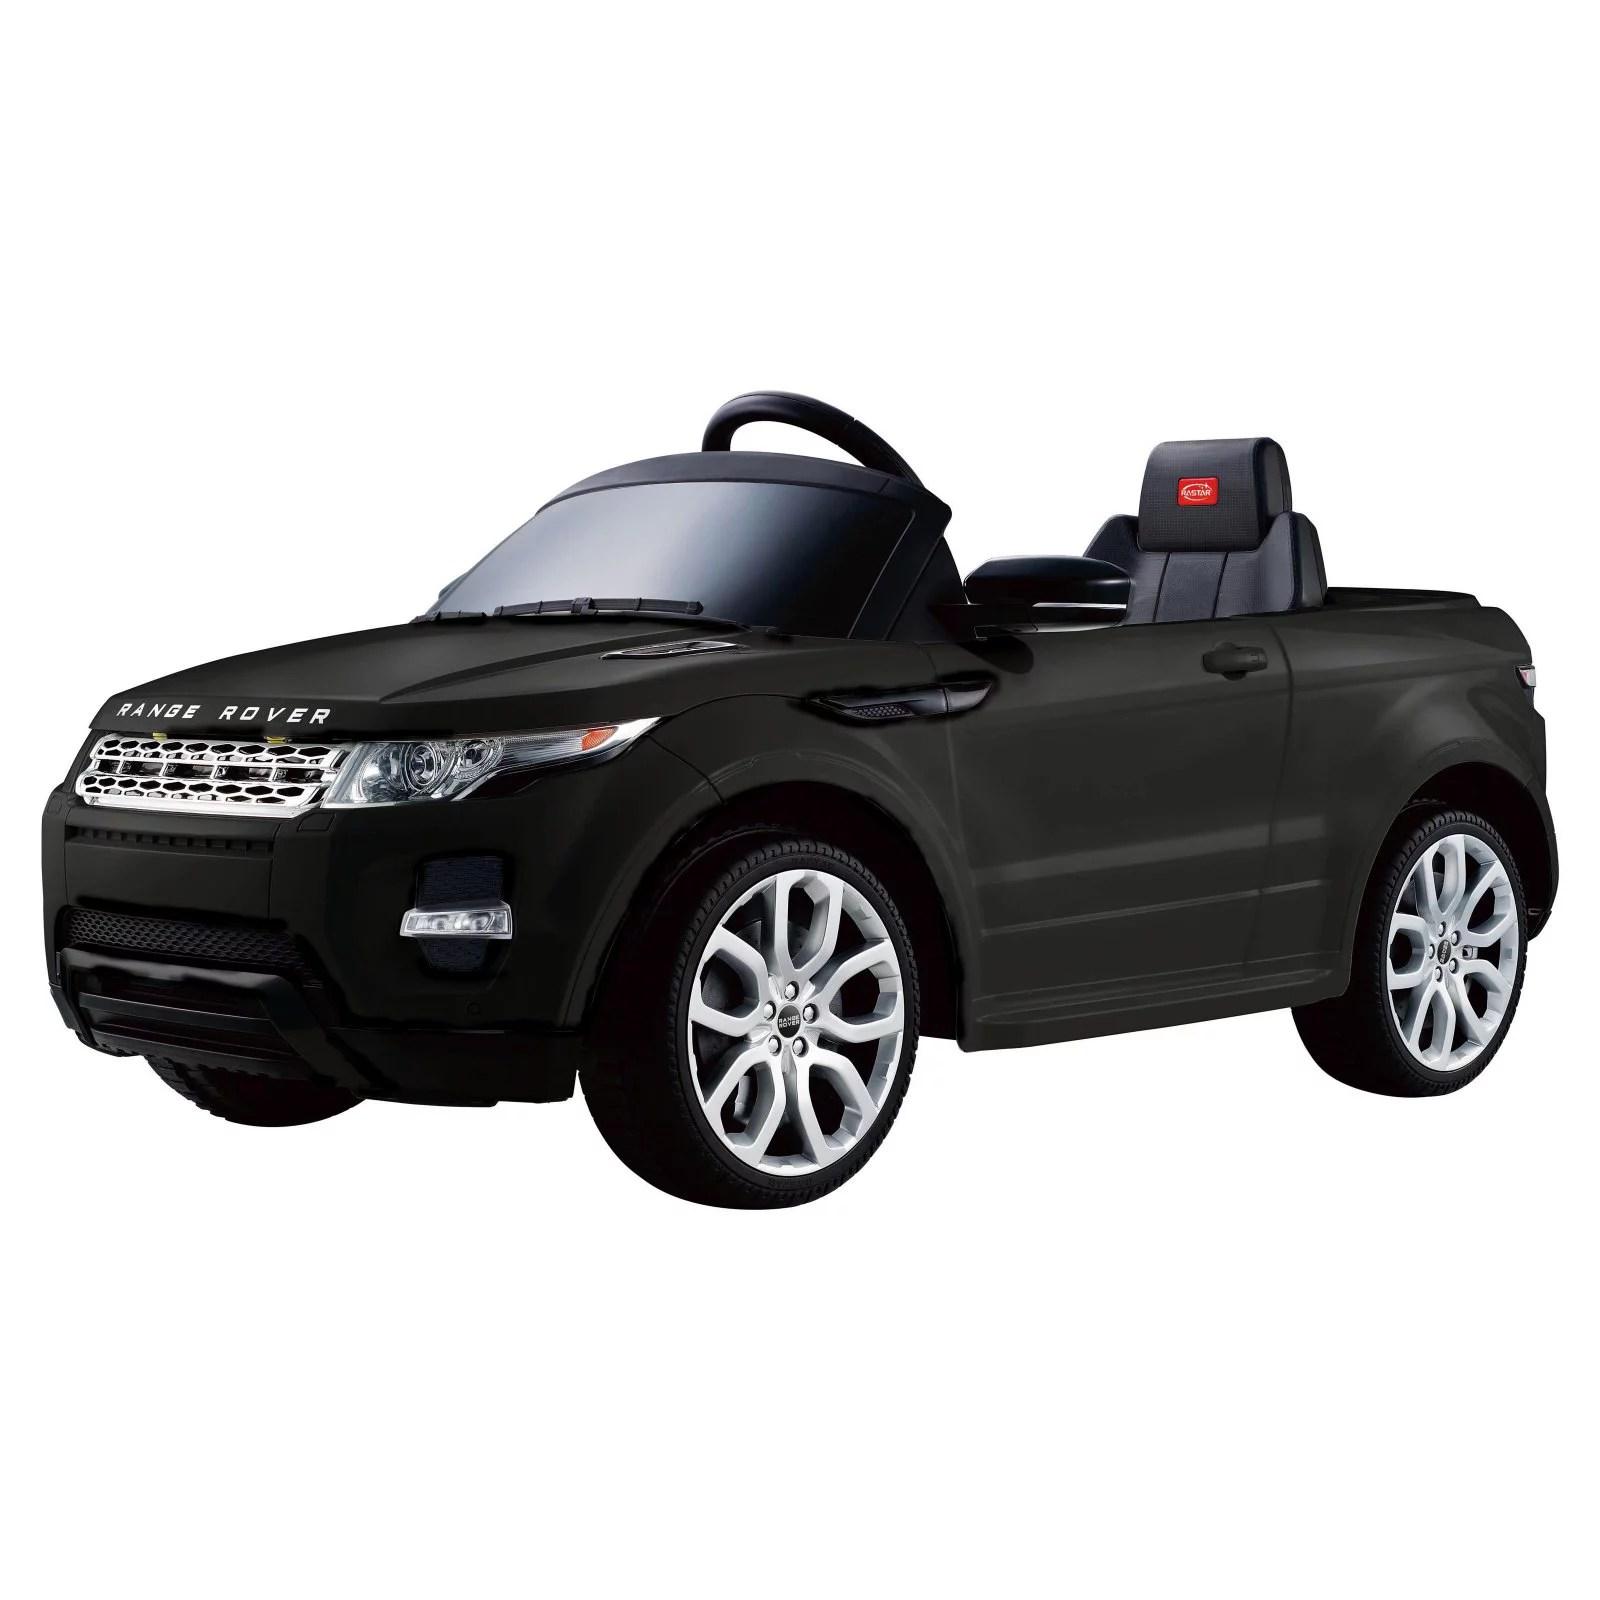 Range Rover Evoque 12V Ride Black Walmart